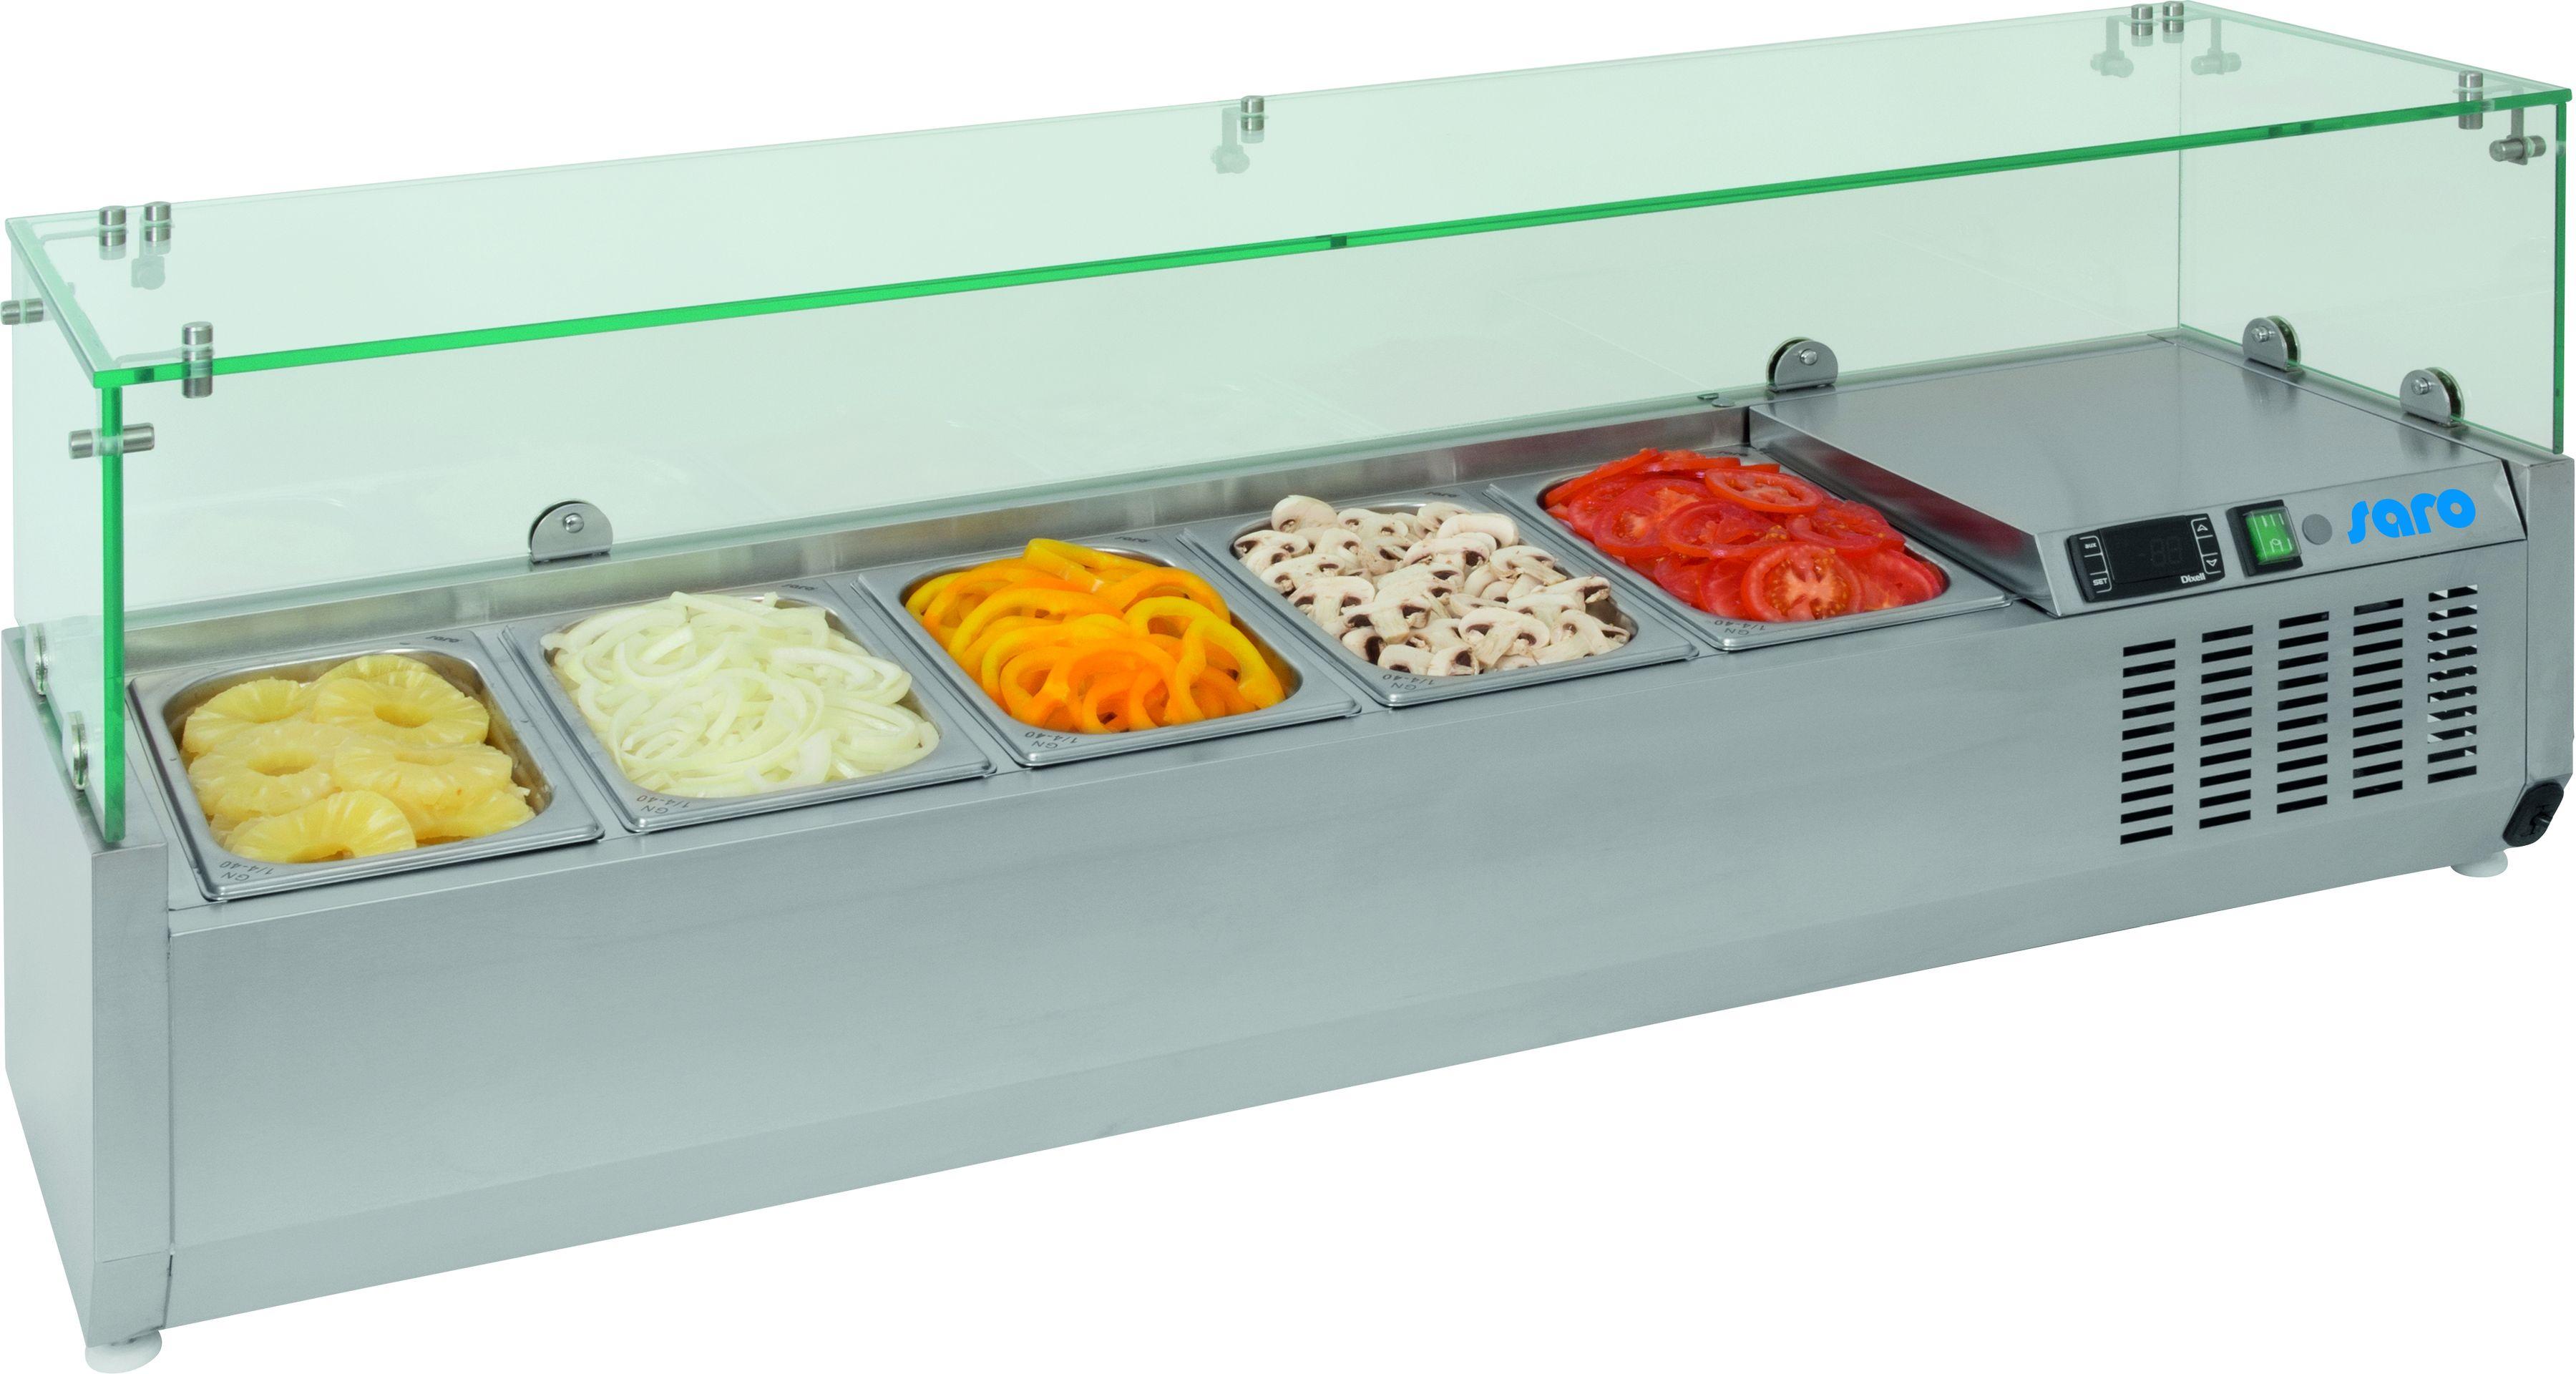 Refrigerated Table Top Display VRX 1200/330 | Saro